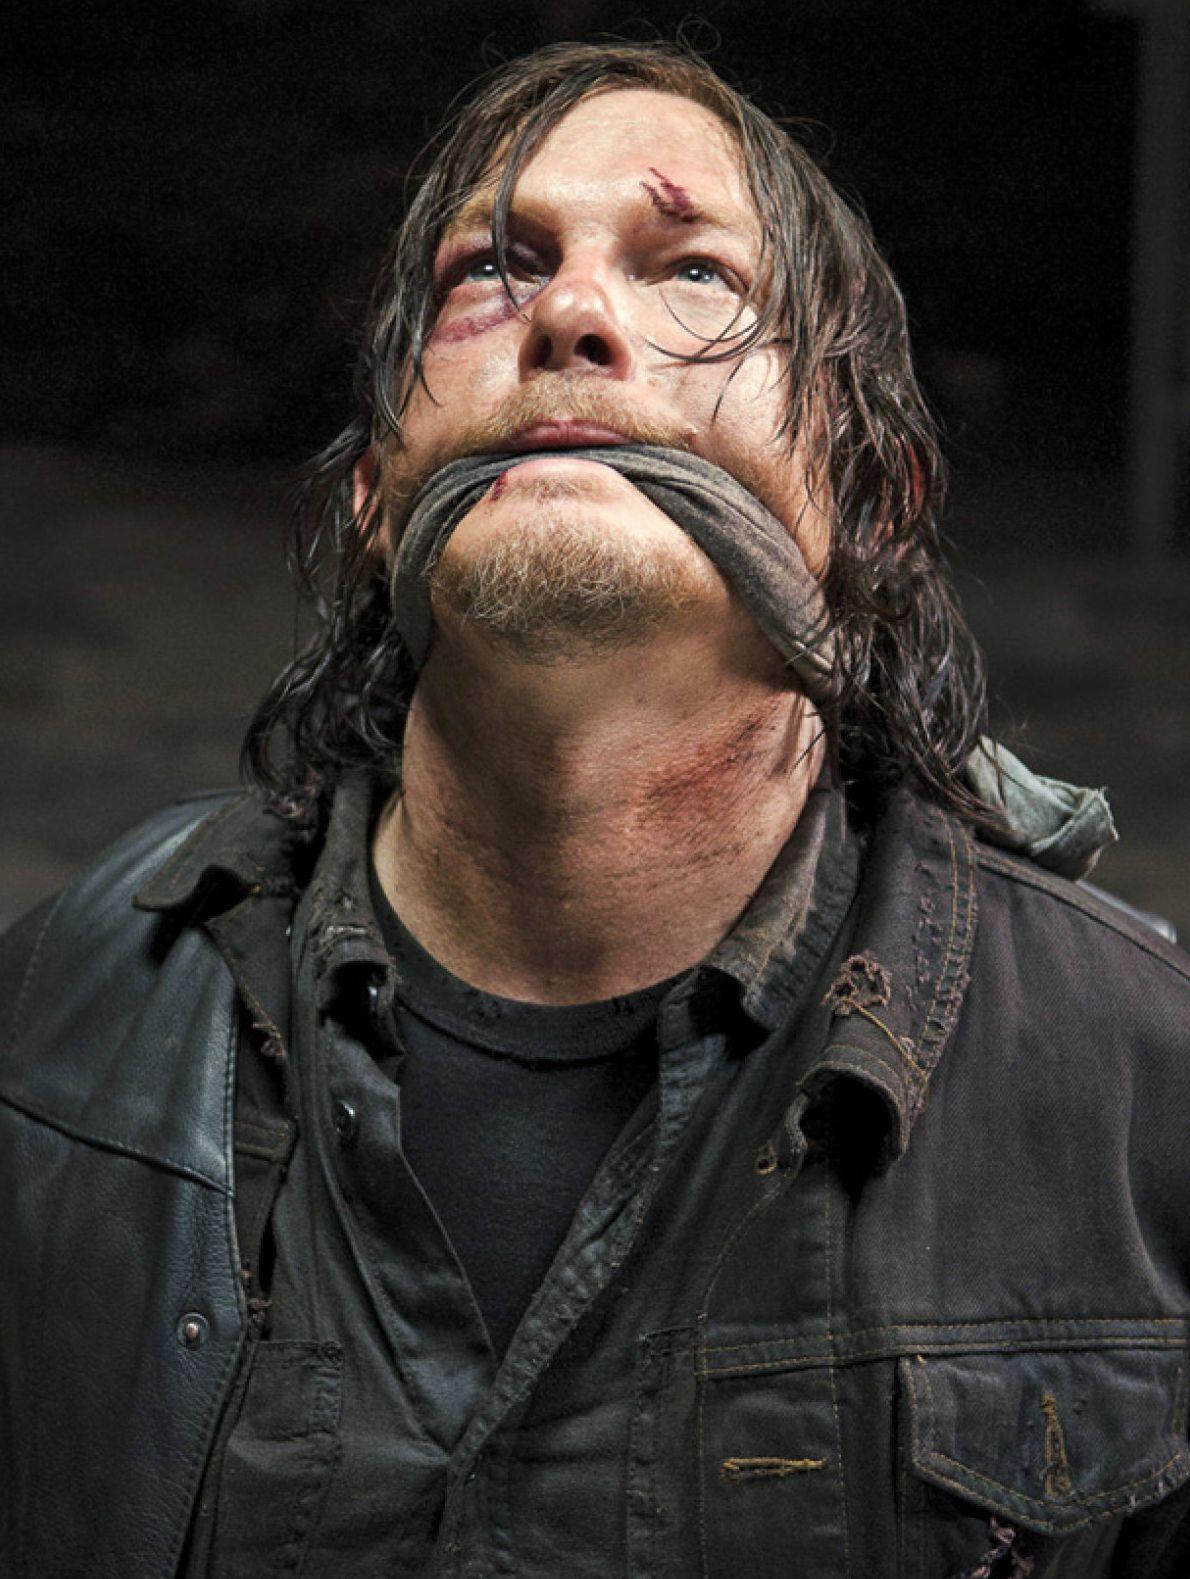 Daryl Dixon (Norman Reedus) in The Walking Dead season 5